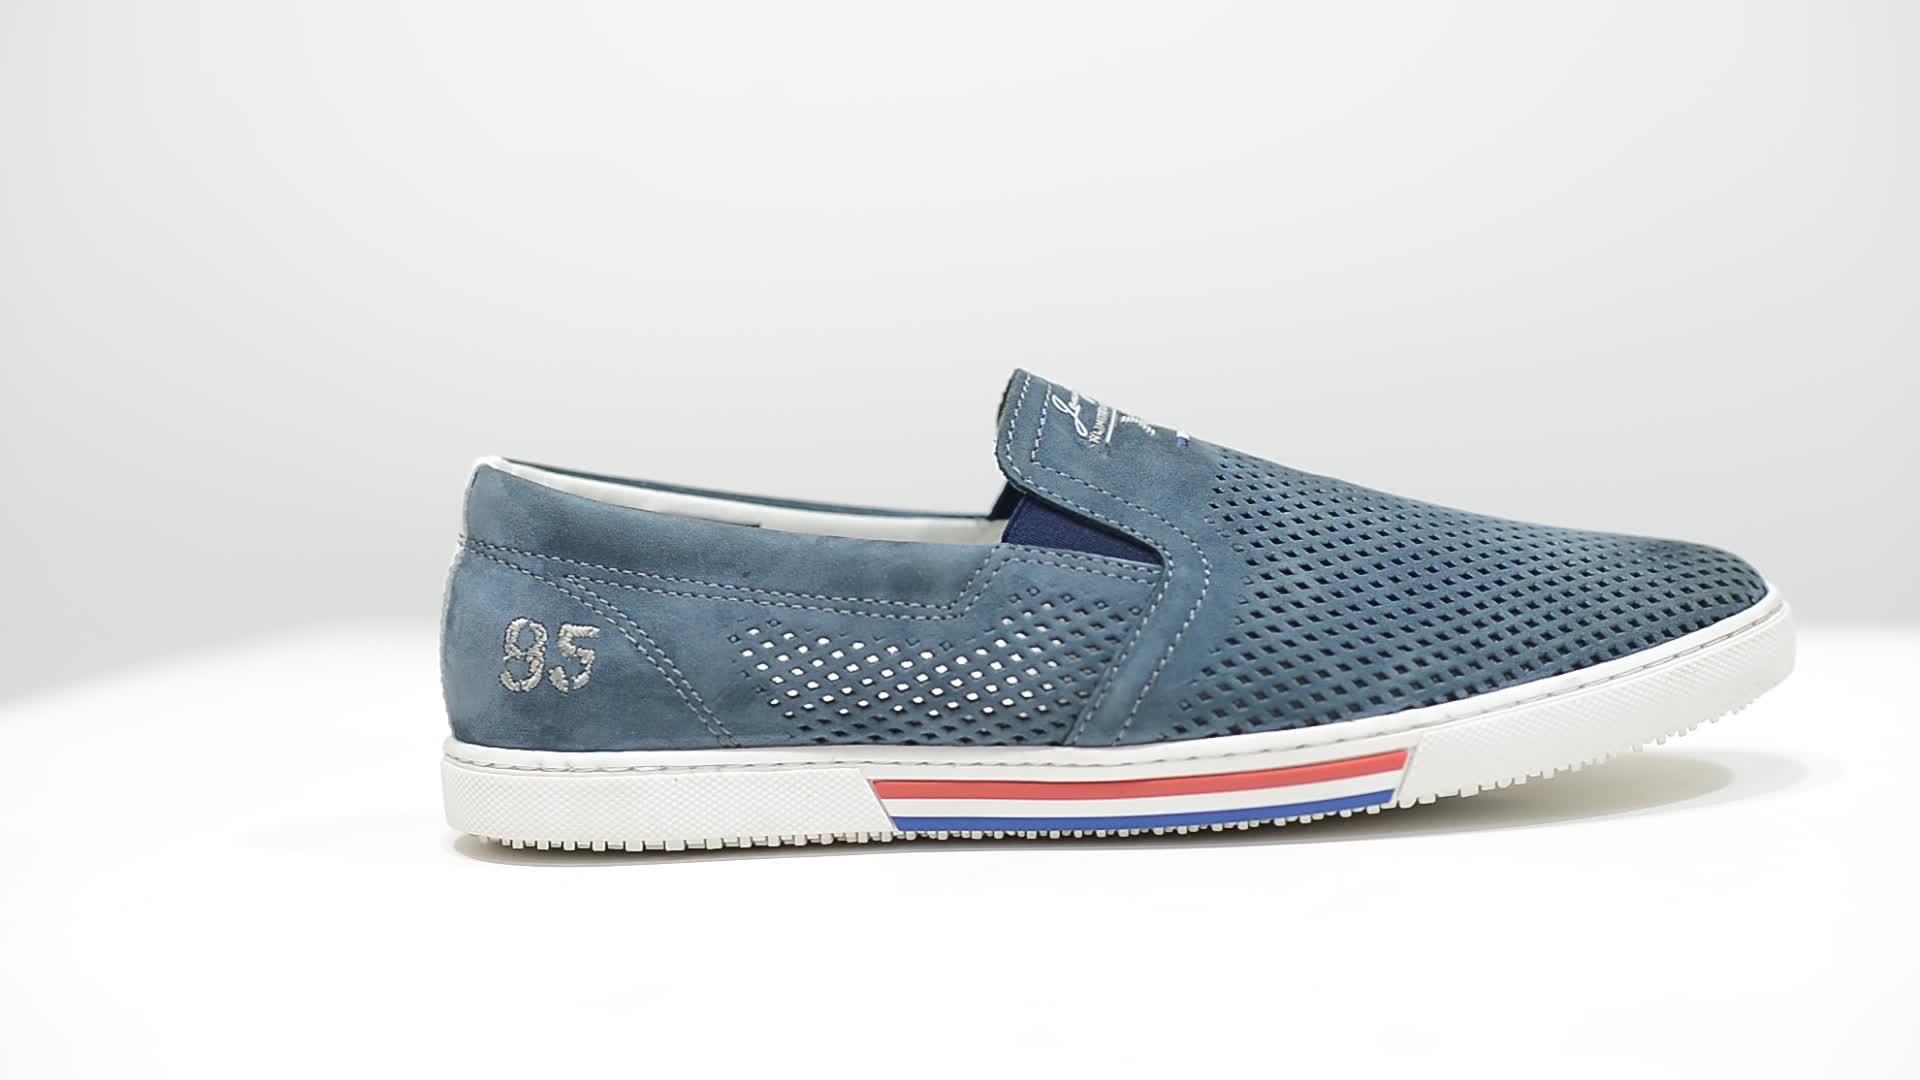 Men's shoes slip-ons L712sn